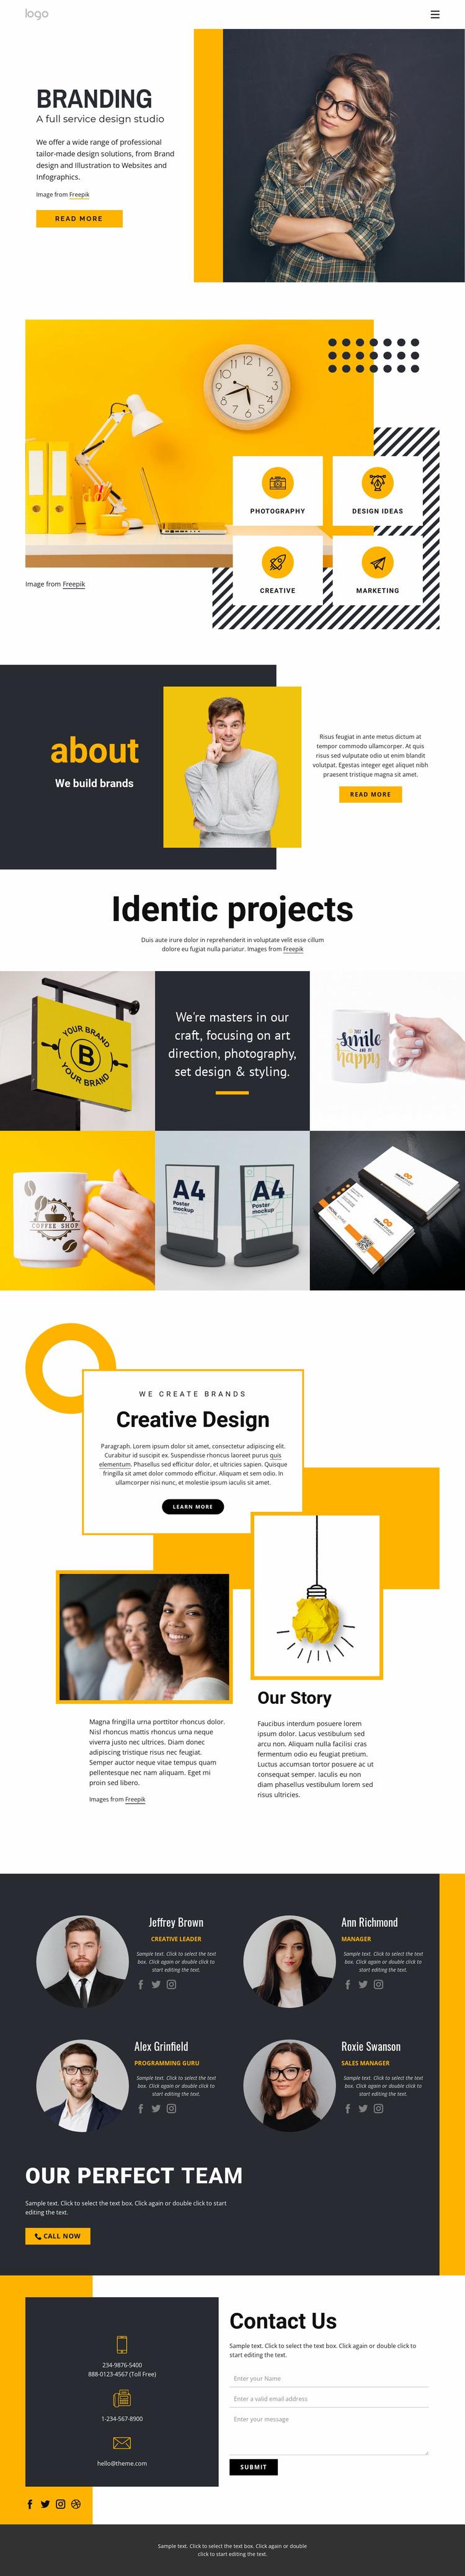 Full-service design studio WordPress Website Builder